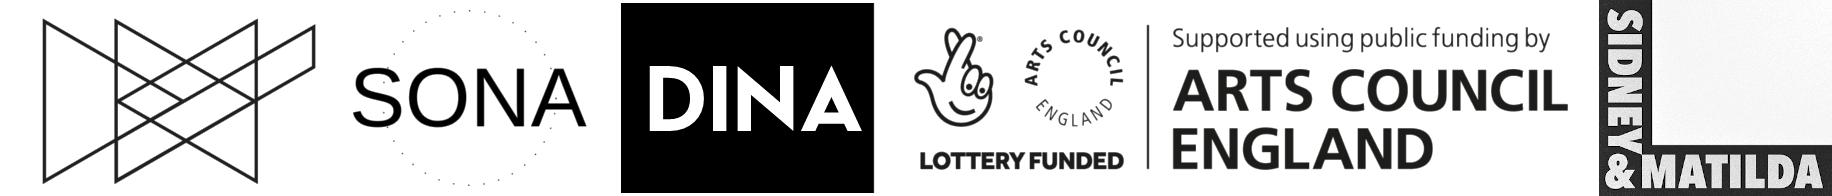 landmass logos